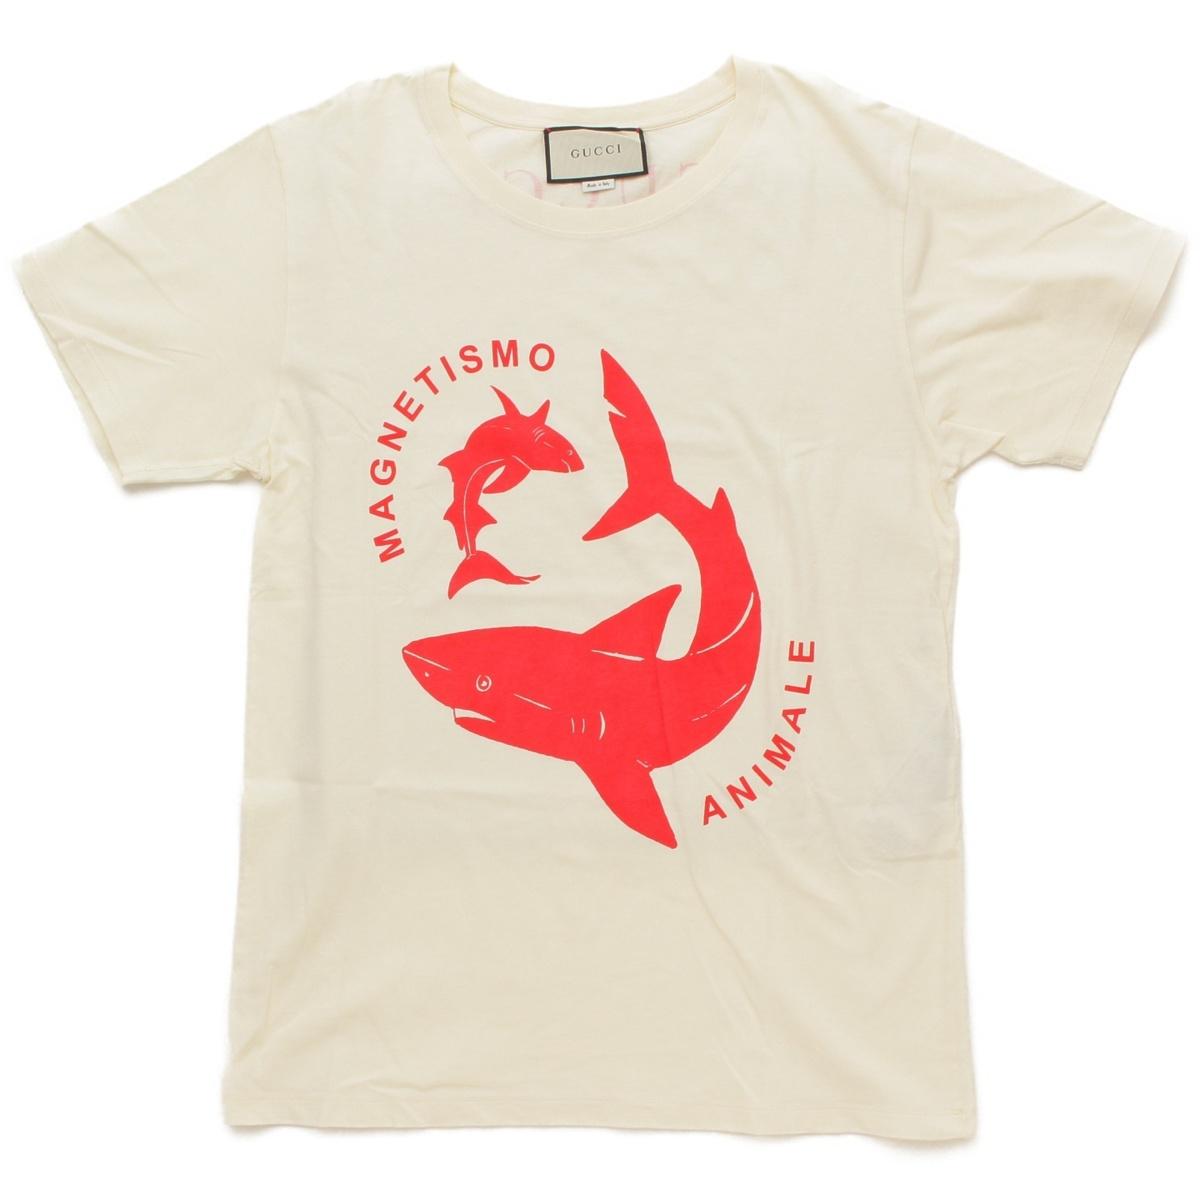 【10%OFFセール】【グッチ】Gucci 18SS シャーク Tシャツ 493117 アイボリー レッド XS 【中古】【鑑定済・正規品保証】65085